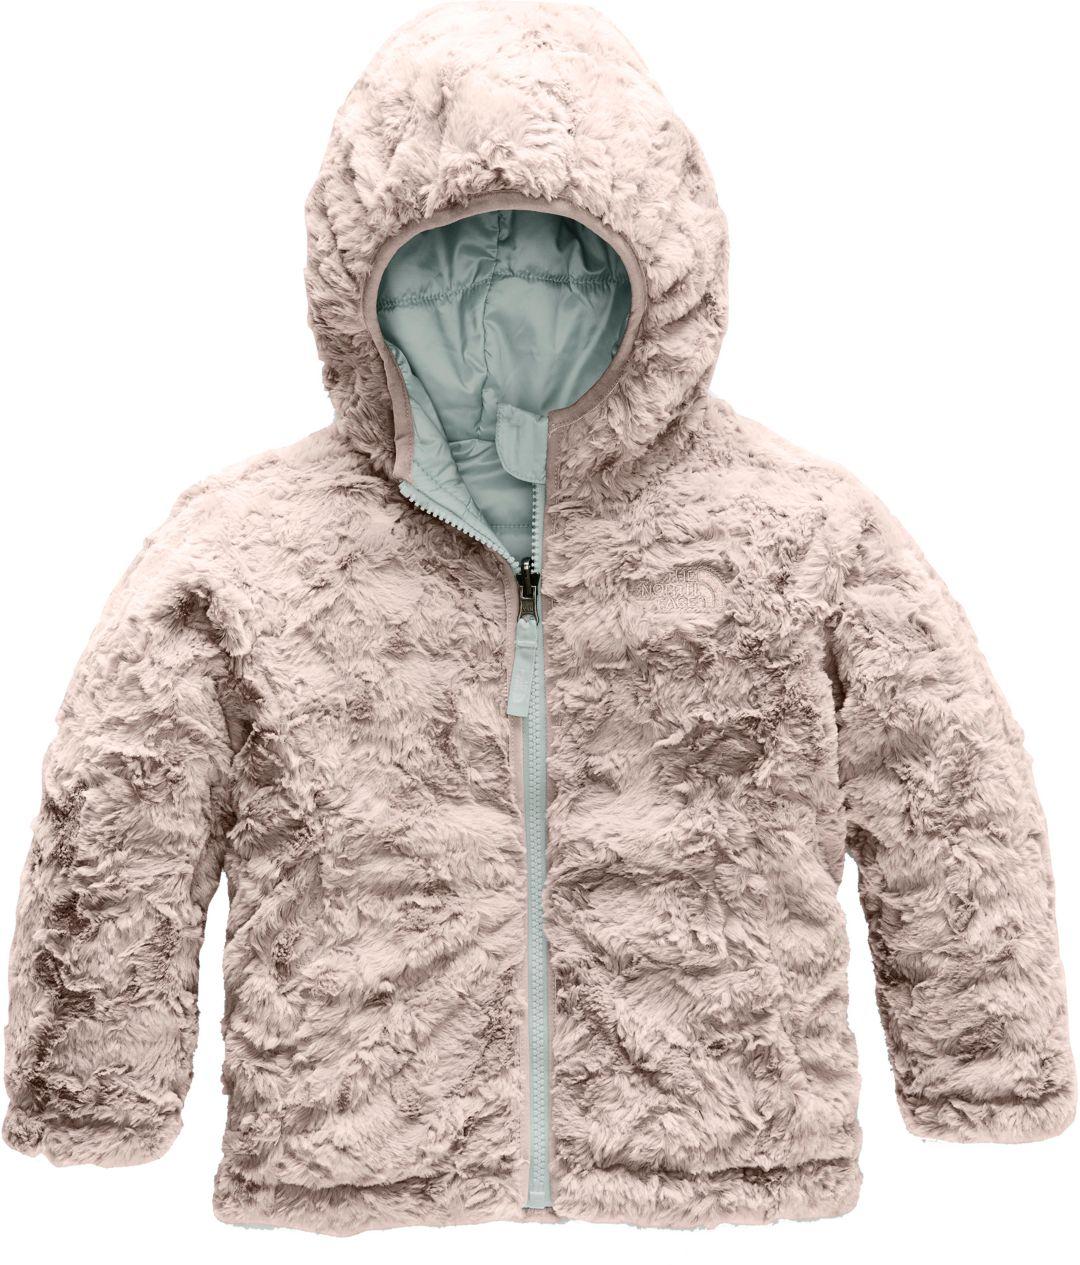 e5c593dee The North Face Toddler Girls' Reversible Mossbud Swirl Fleece Jacket